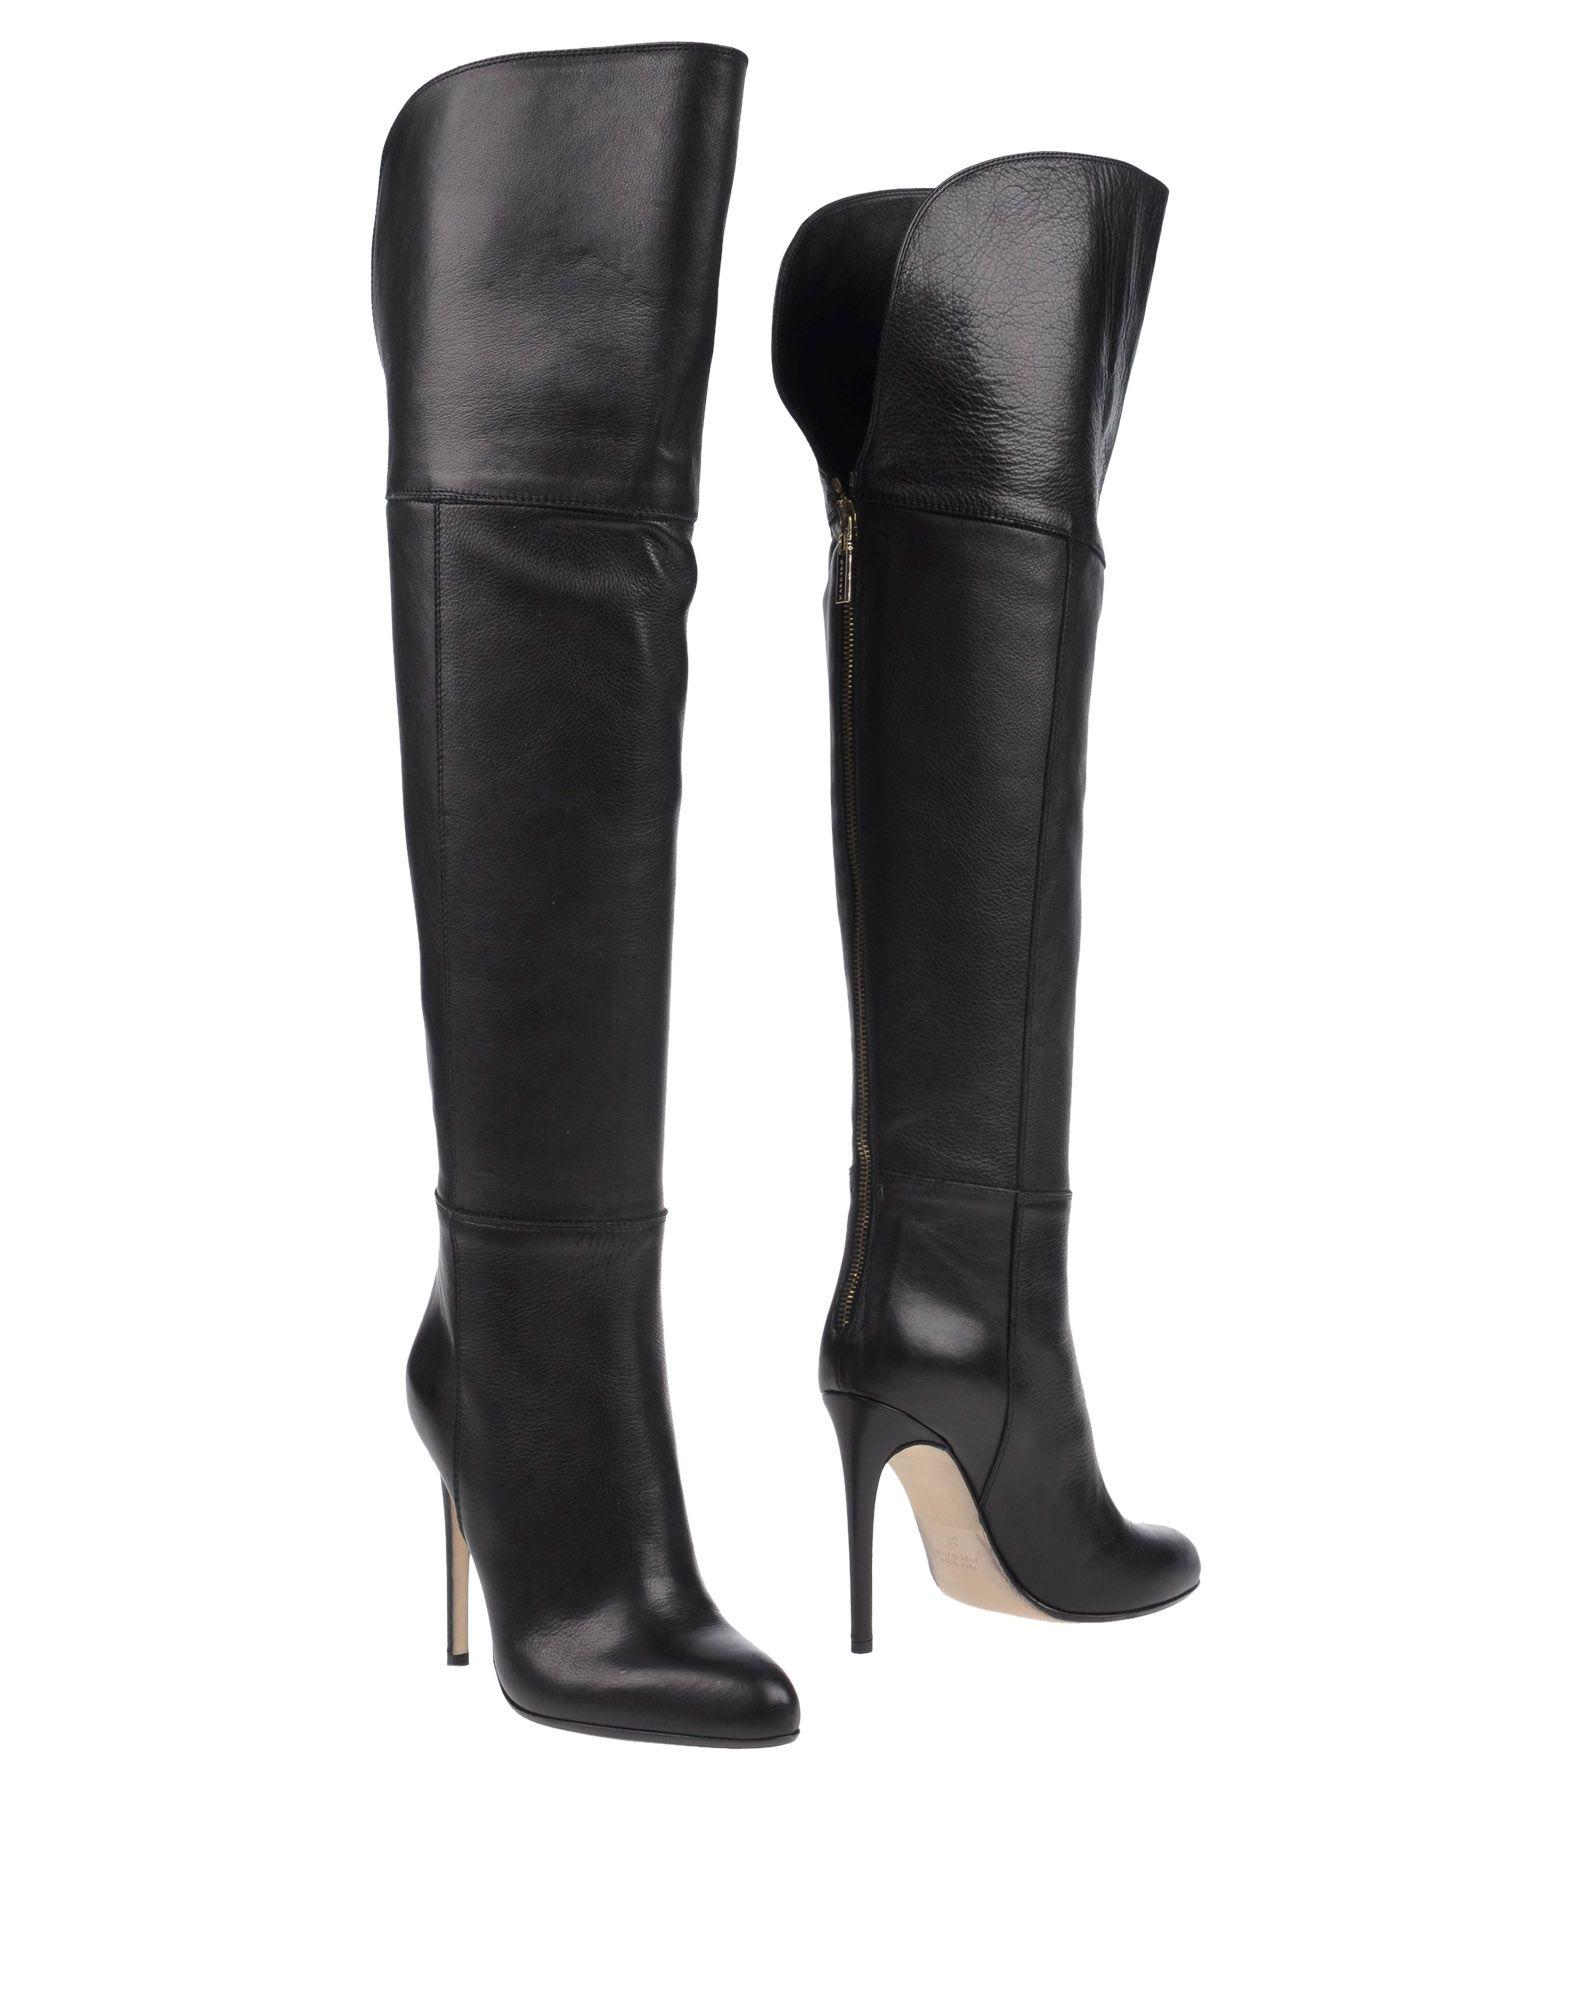 Stivali Mangano Donna - 11203571PX elegante